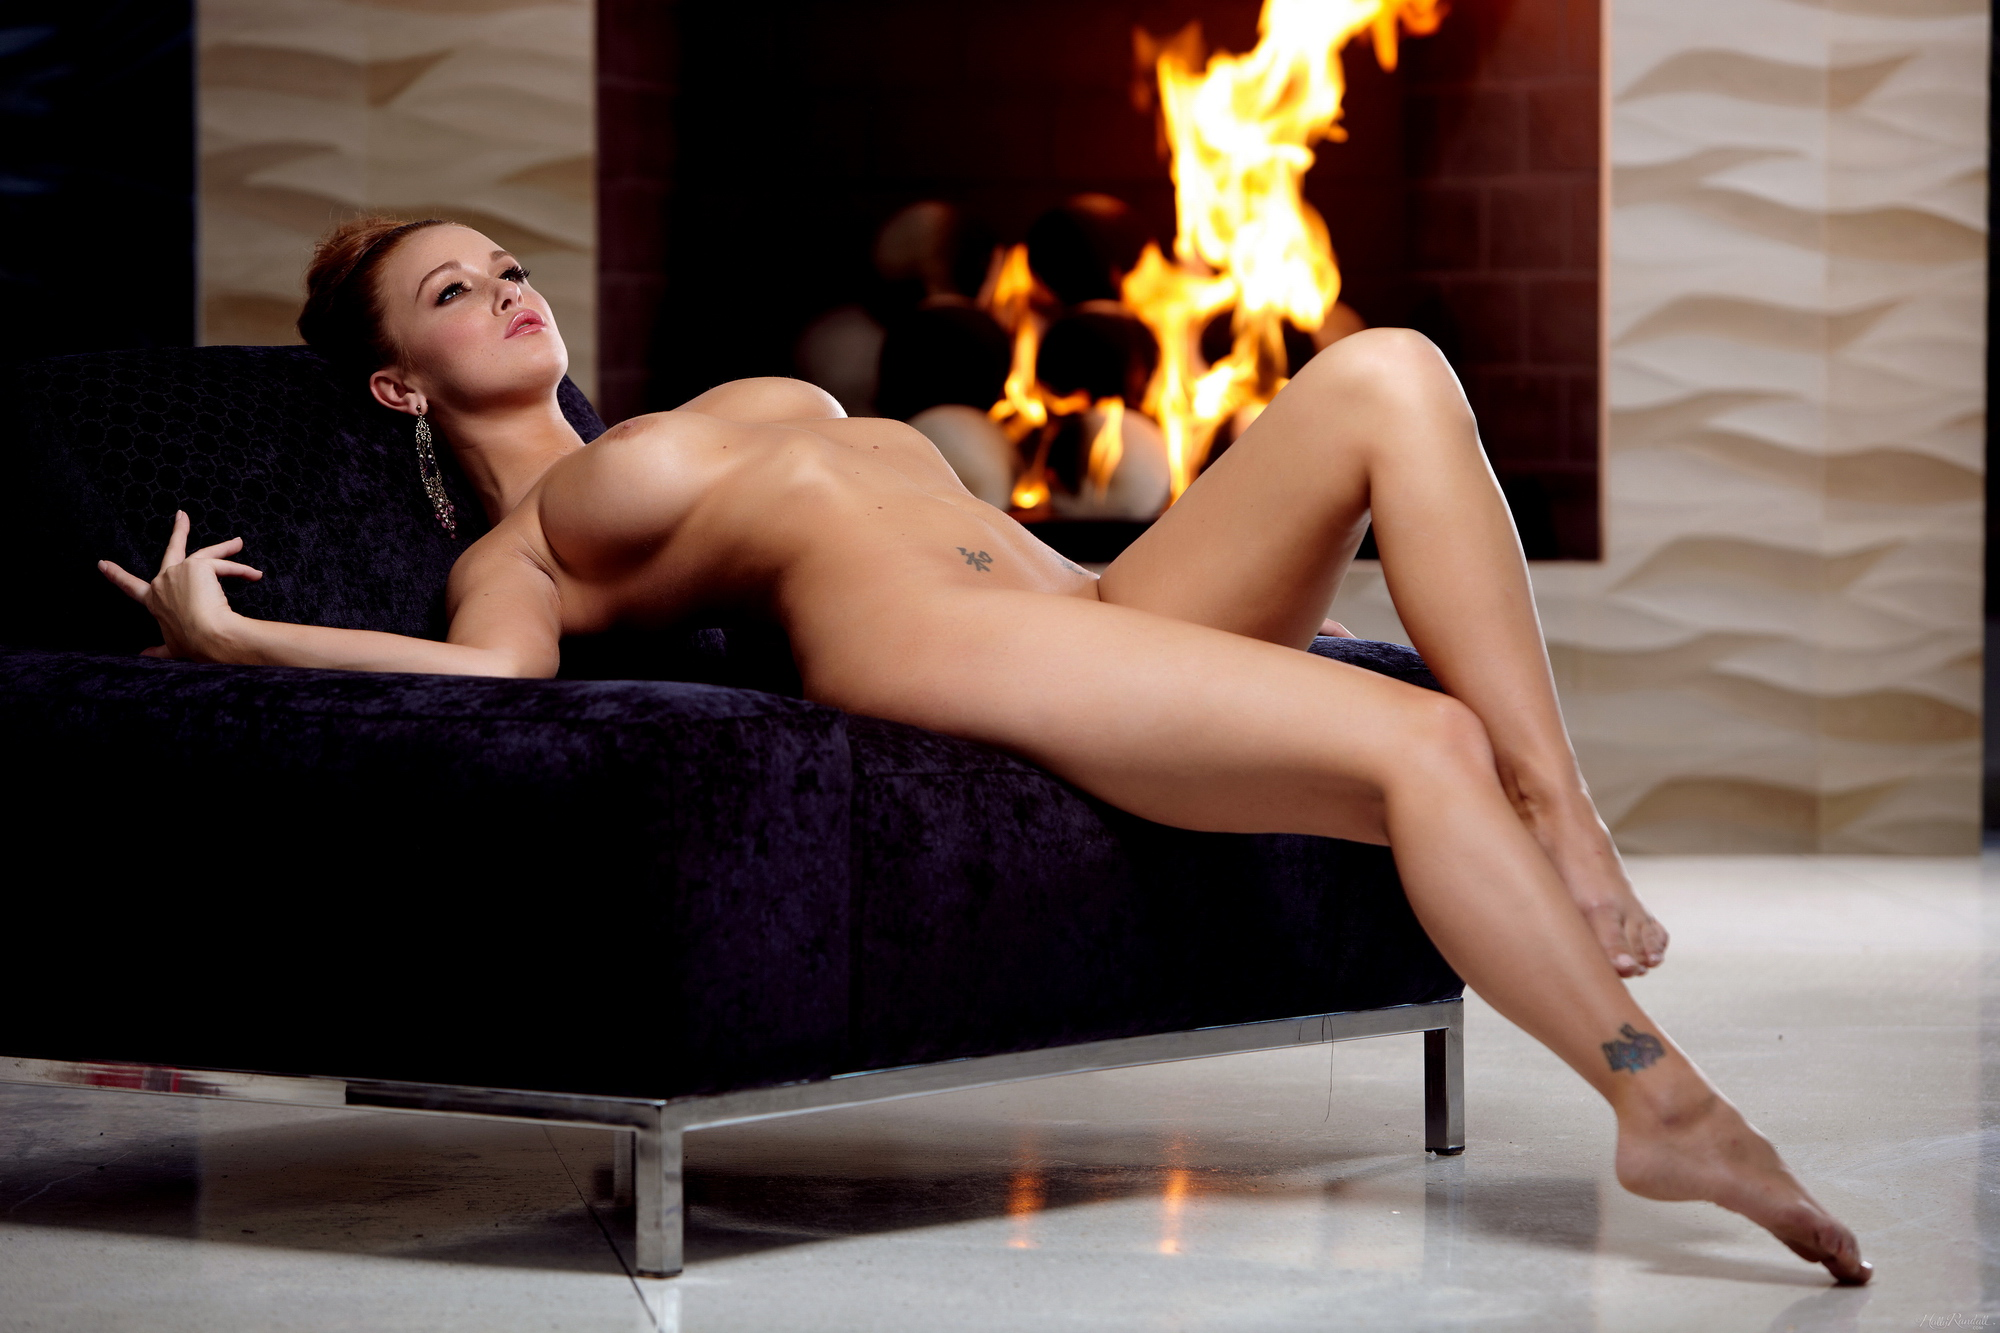 leanna-decker-nude-fireplace-redhead-hollyrandall-14